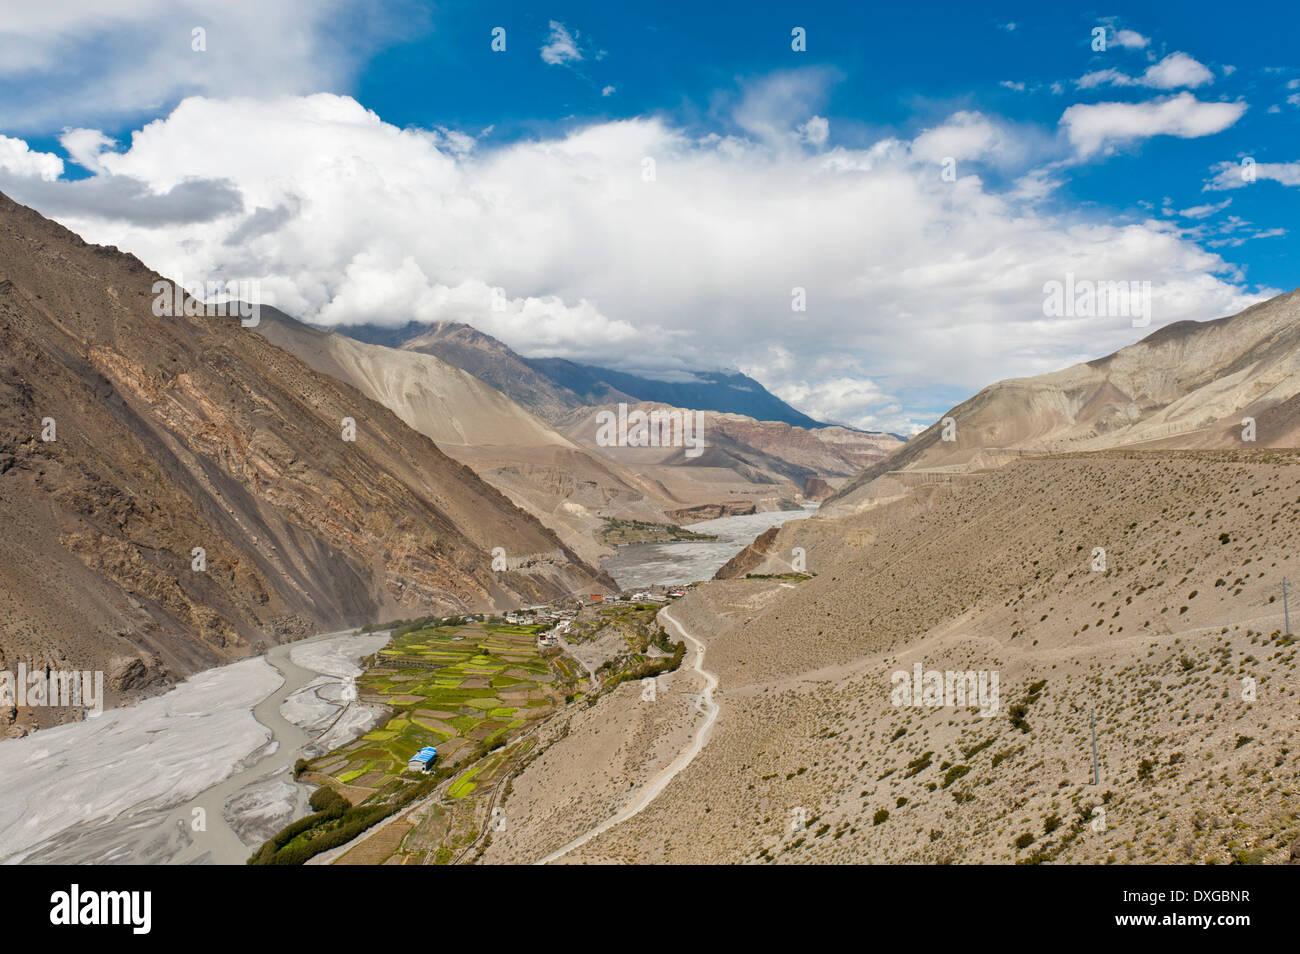 Vista en un profundo valle, arroyo torrencial, valle de Kali Gandaki, exuberantes campos verdes que rodean la aldea de Kagbeni Imagen De Stock